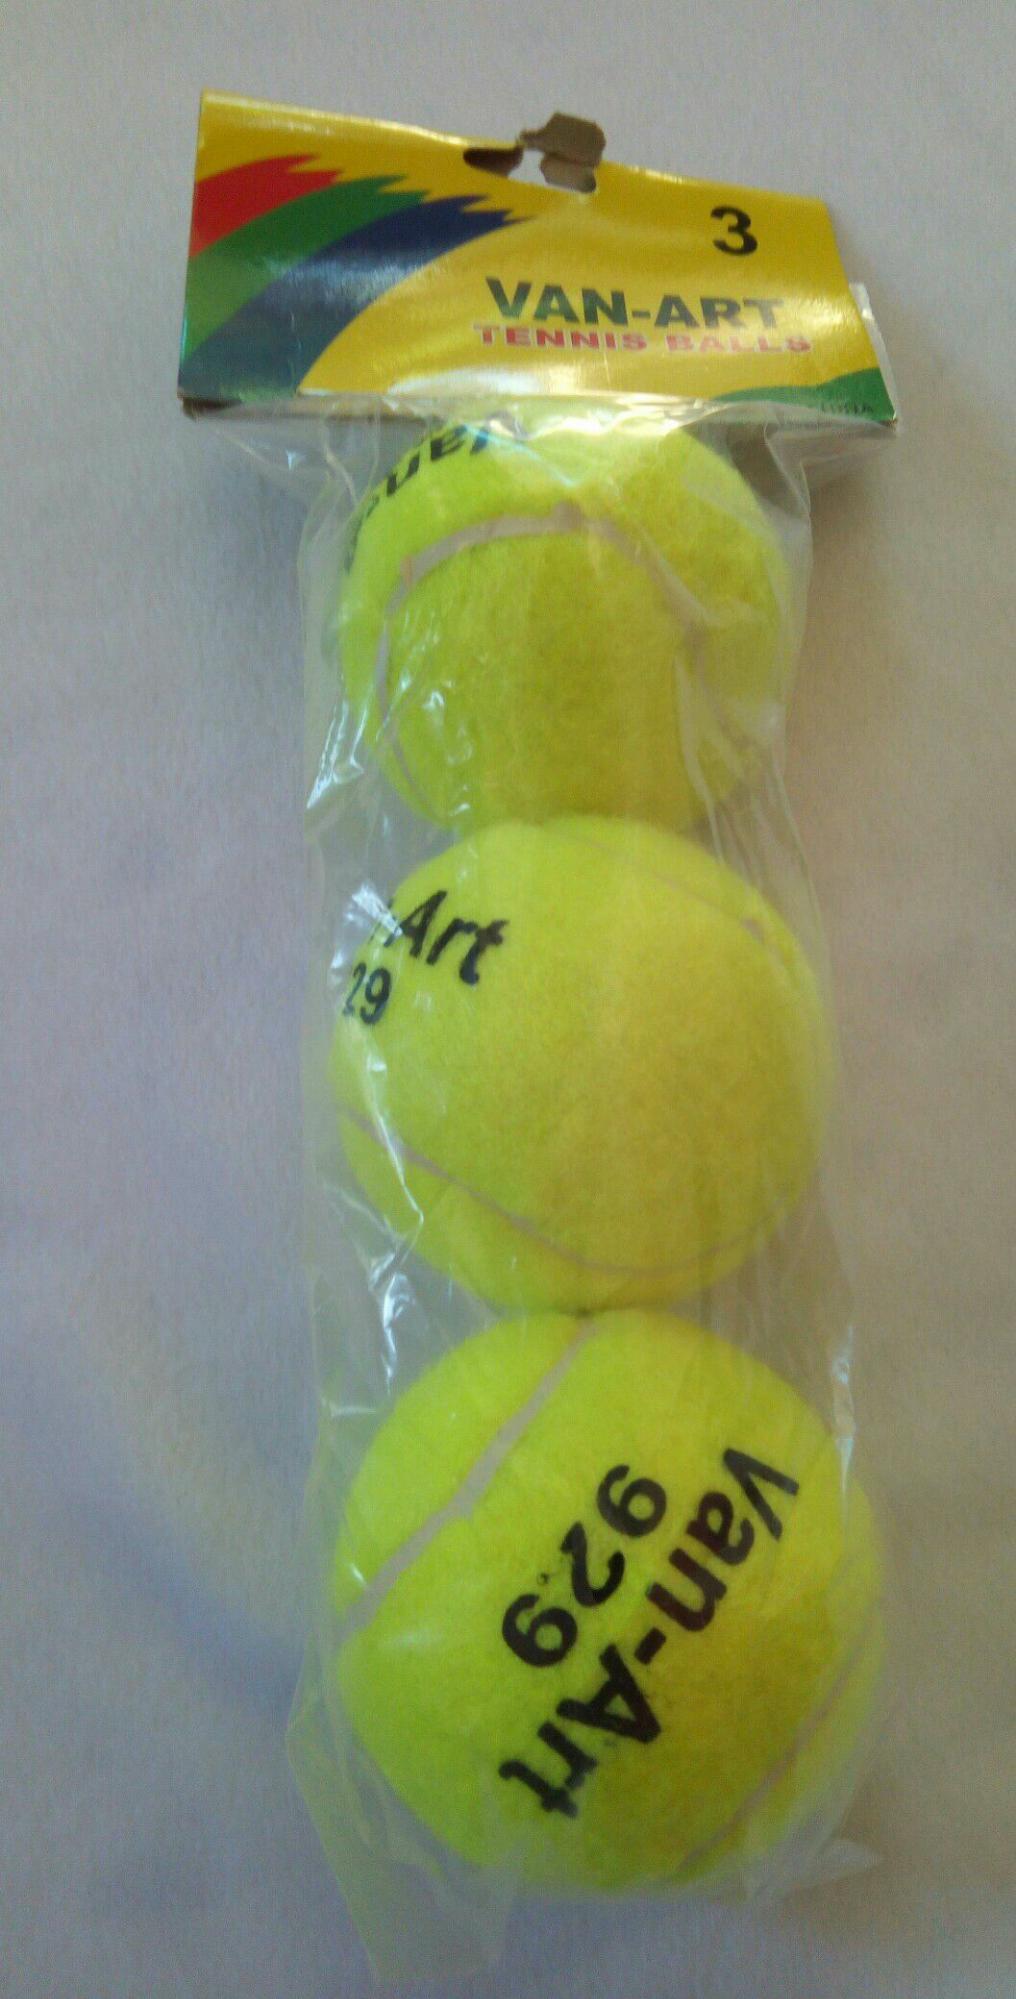 Bola Tenis Extri Jam Tangan Pria X3001a Hitam Kasti Tennis Balls Kwalitas Bagus Harga 1 Set